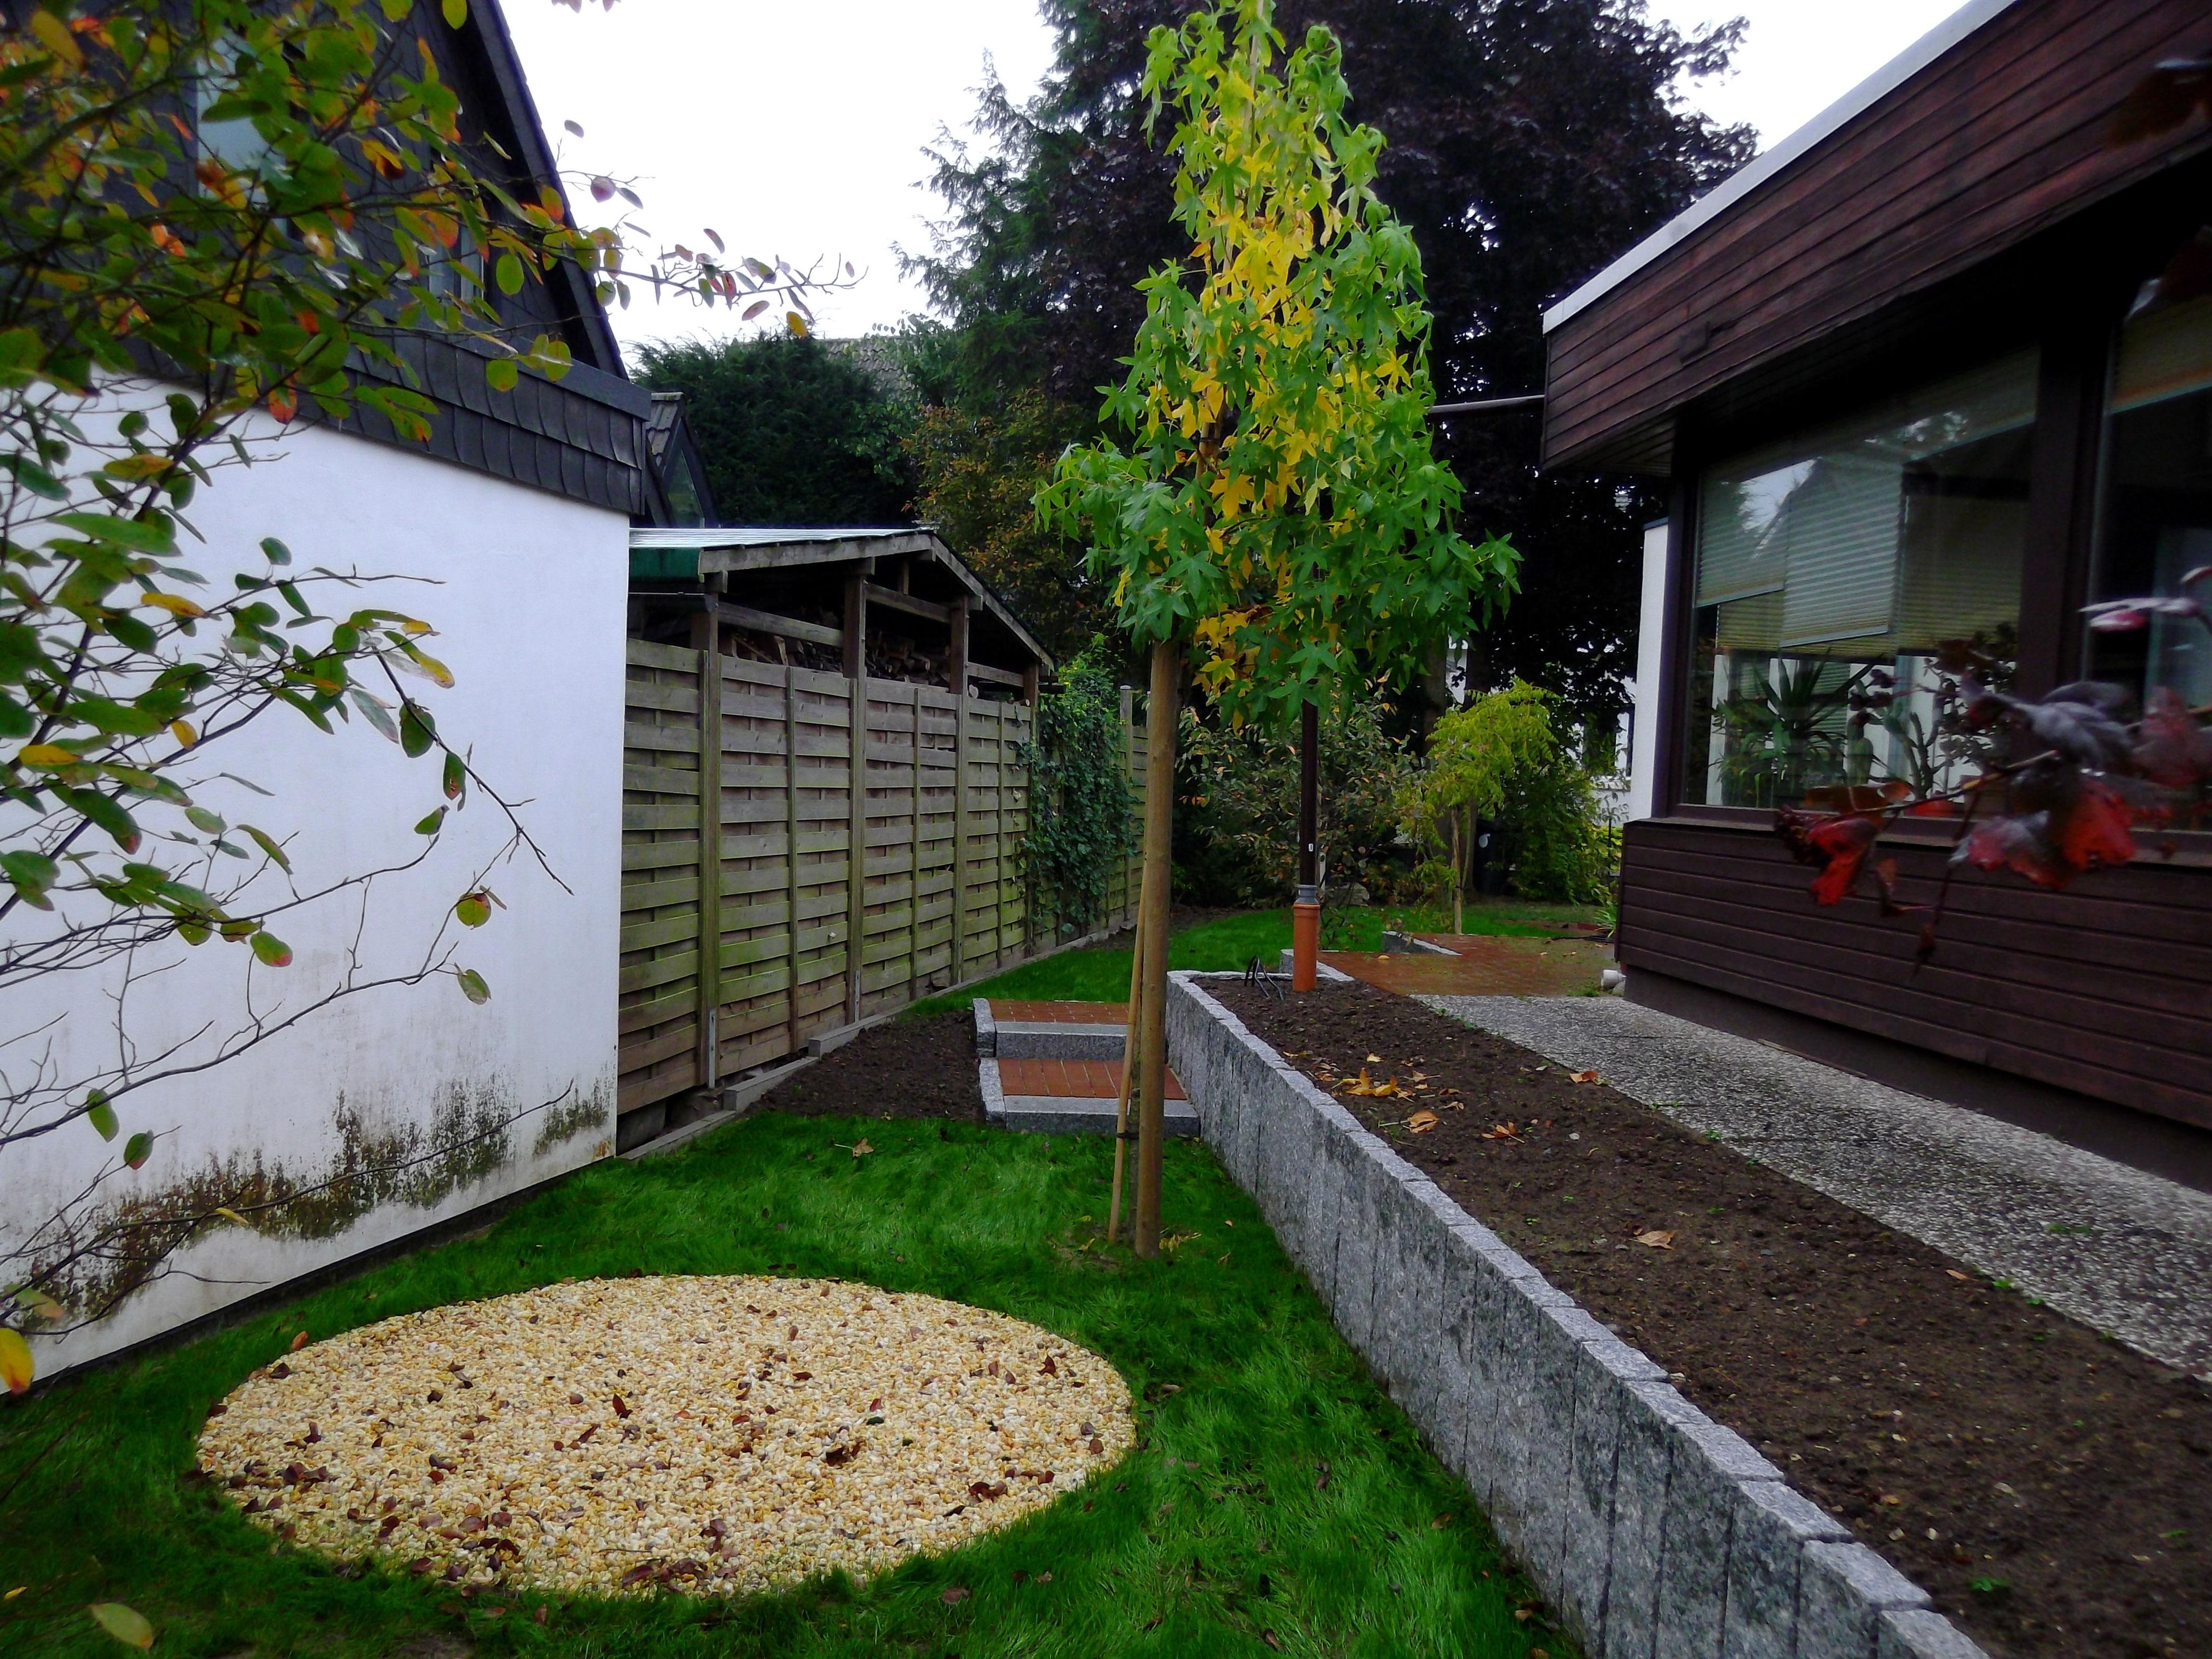 Sitemap peter korfmacher gartengestaltung for Gartengestaltung app